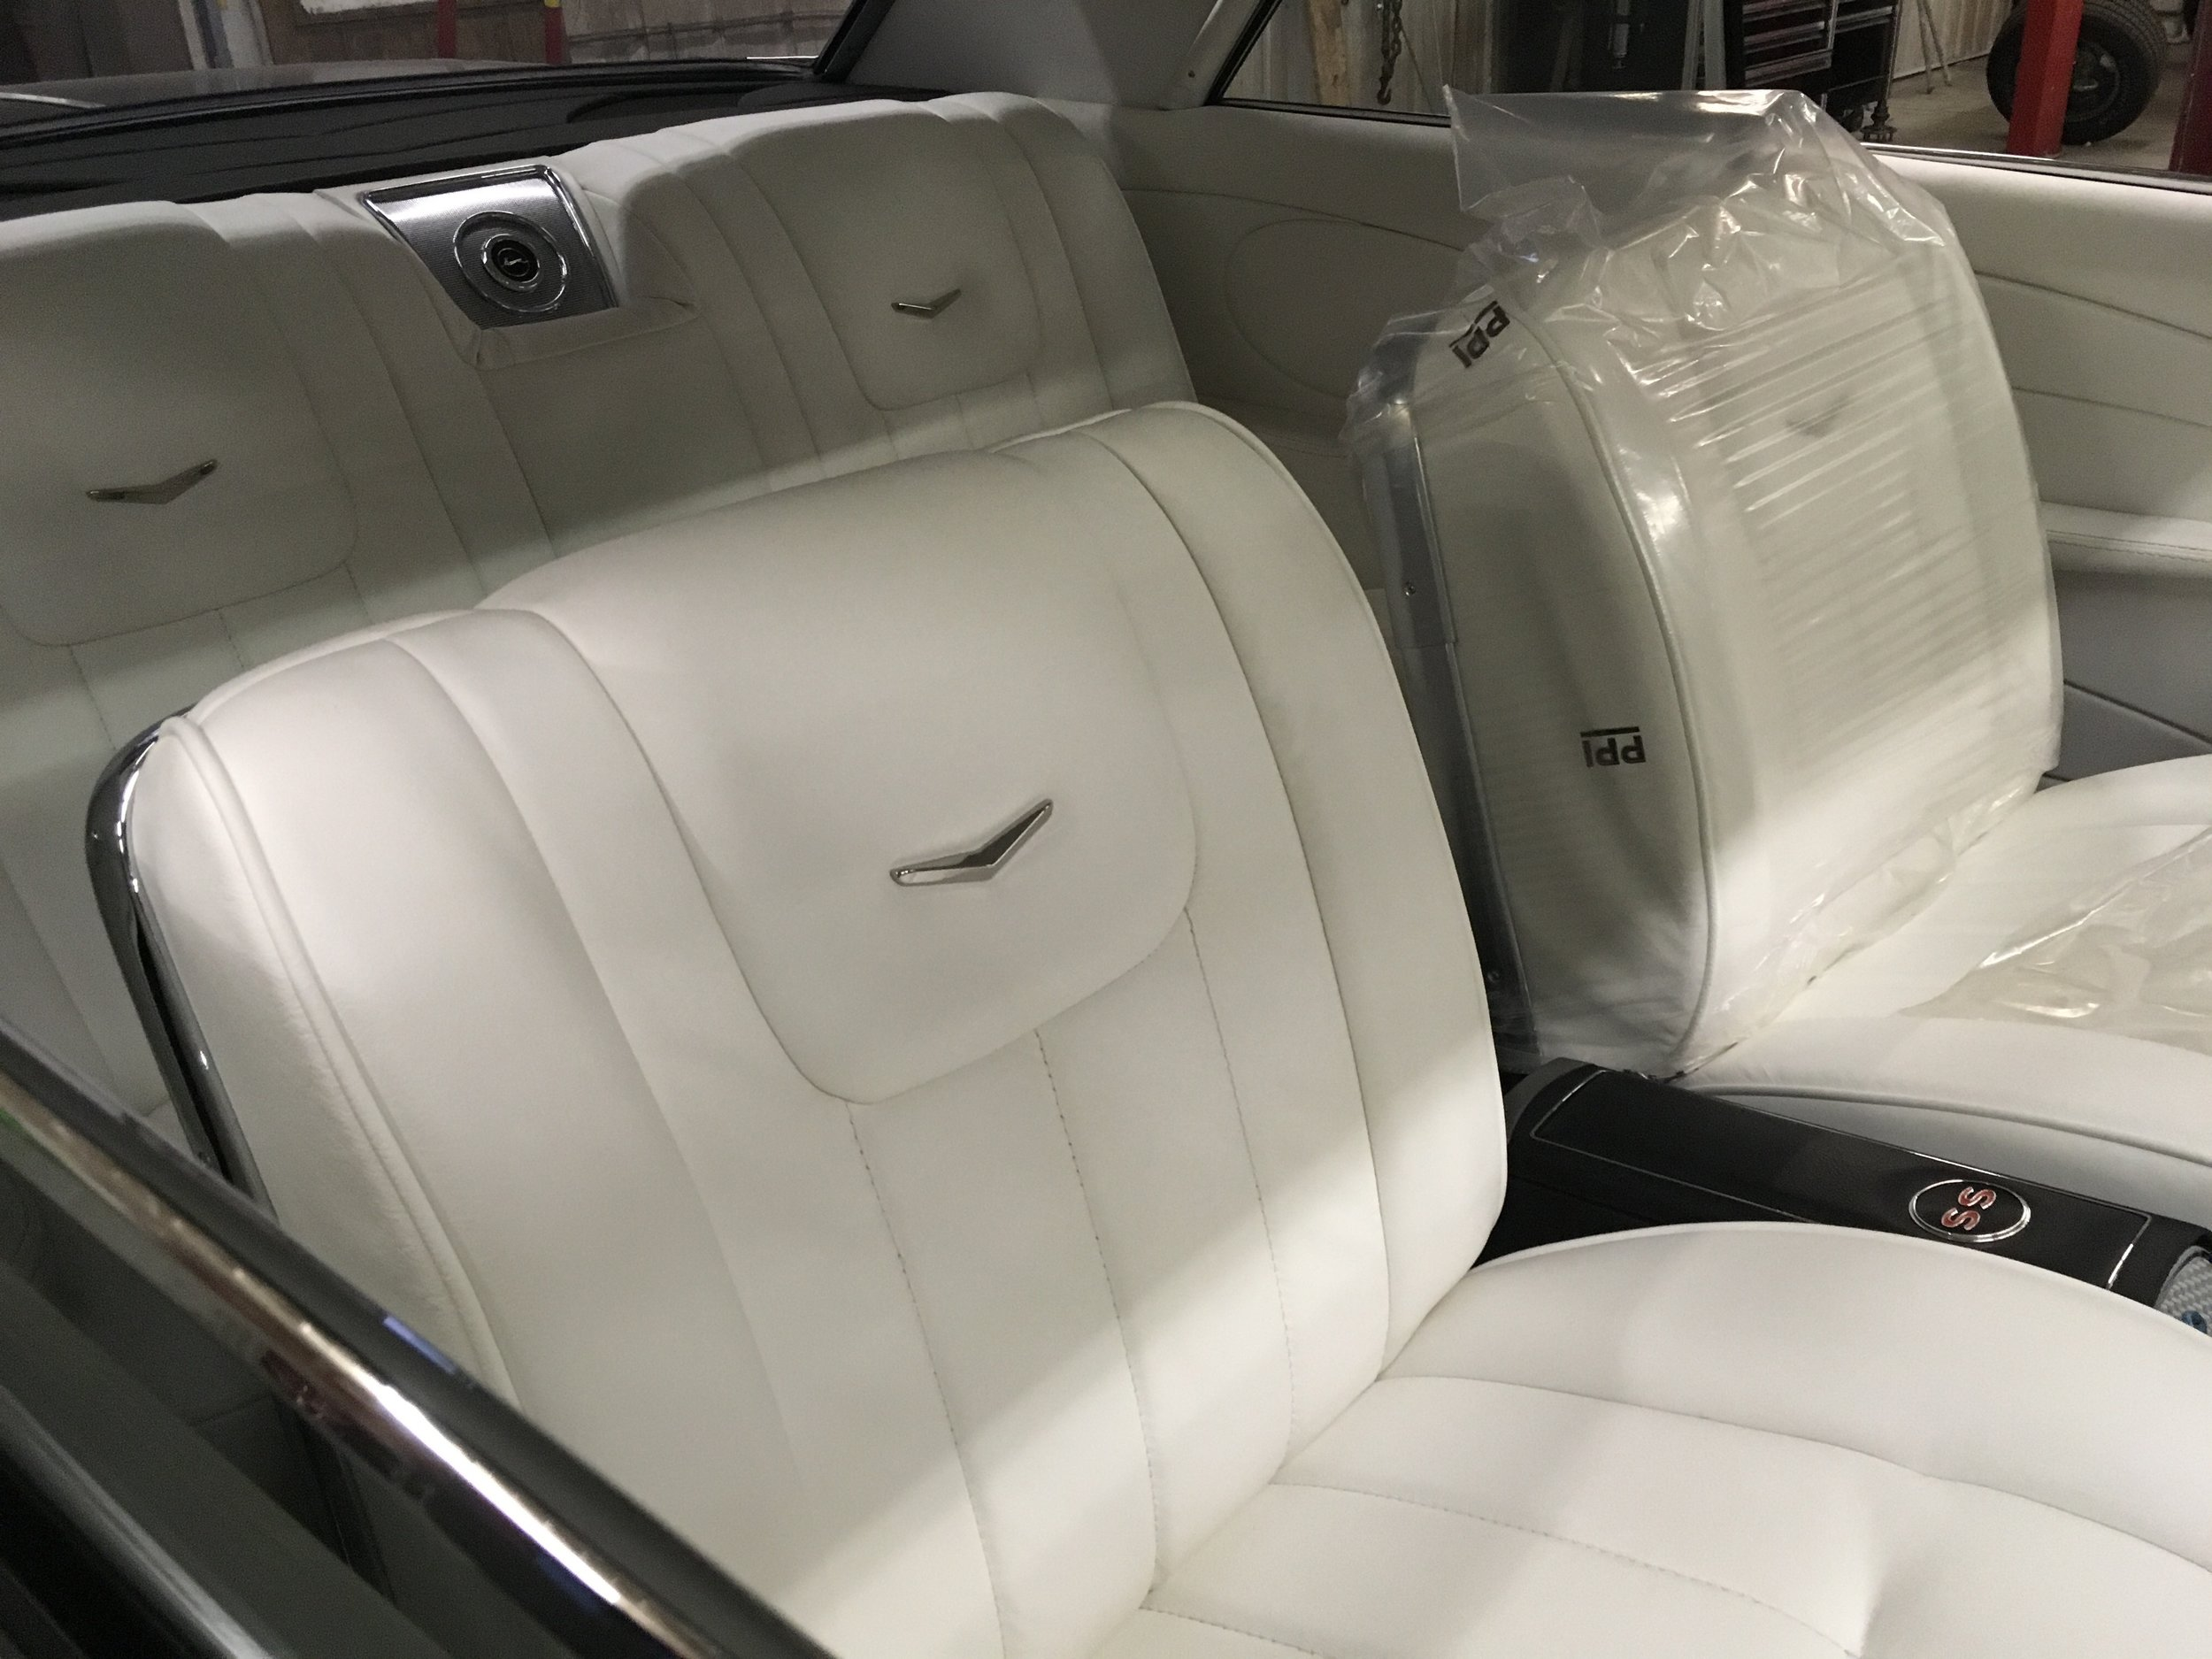 1964-Impala-SS-minneapolis-hot-rod-custom-built-restorations-37.jpg